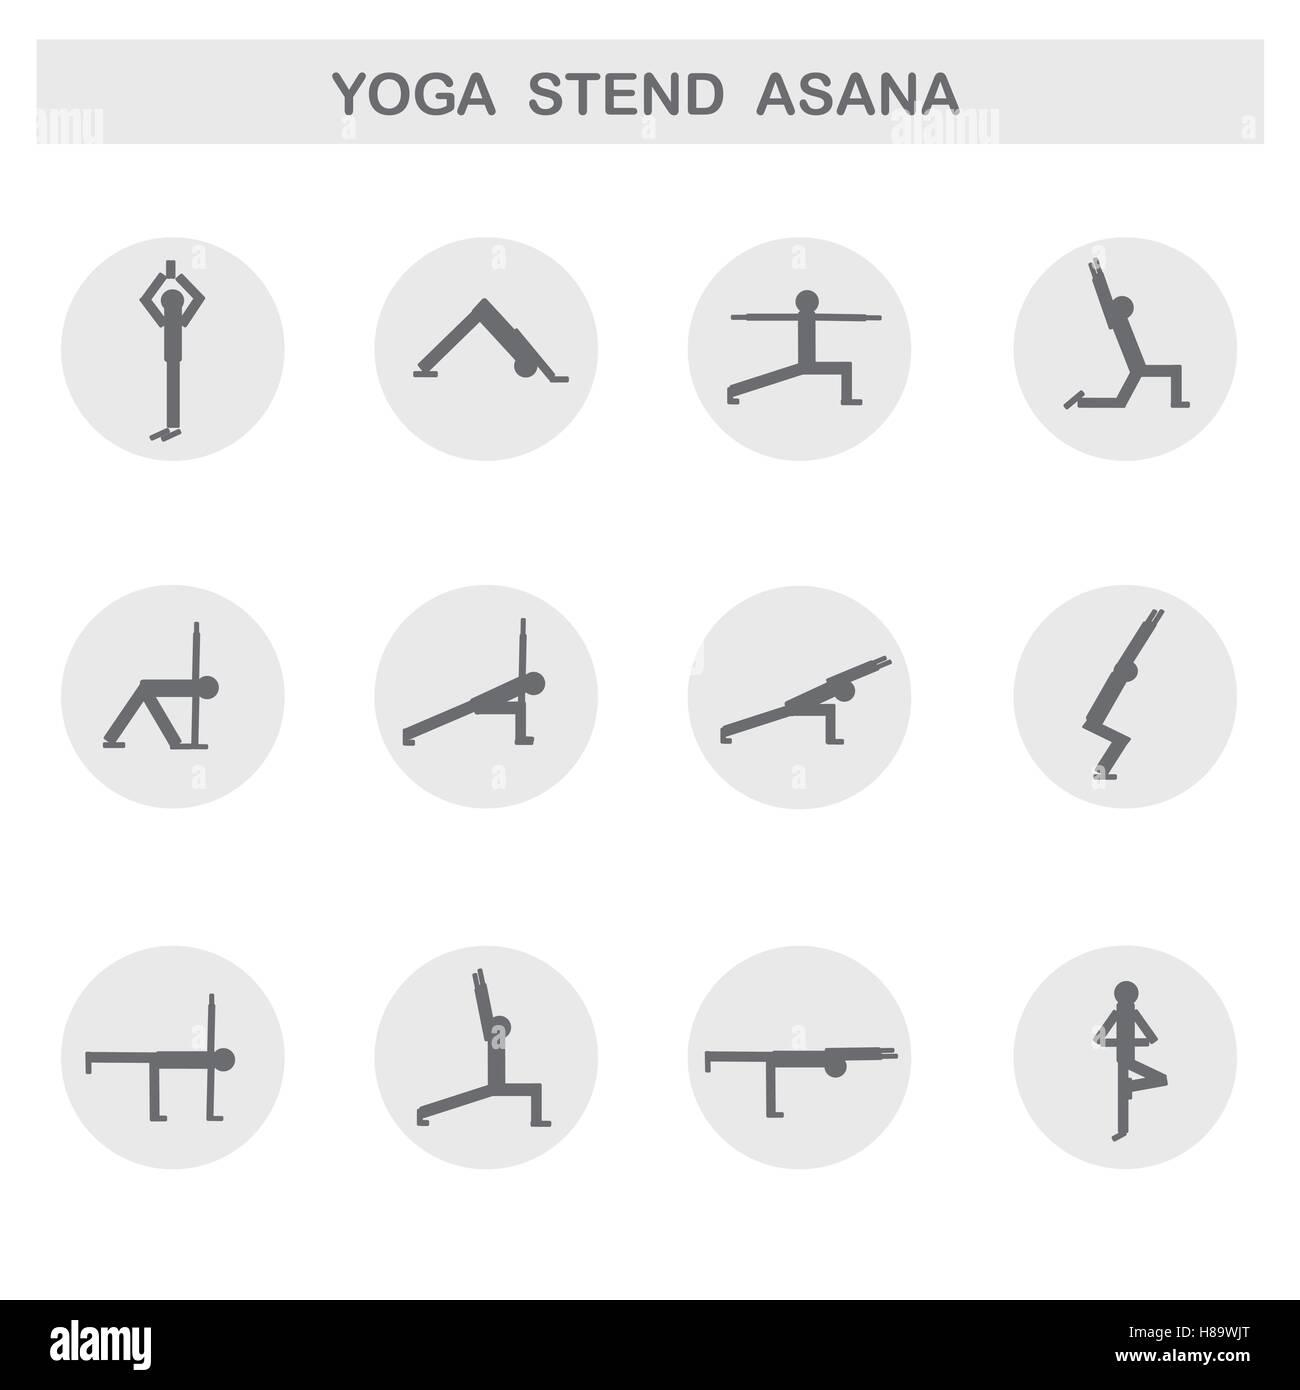 Set of icons. Poses yoga asanas. Vector. - Stock Vector